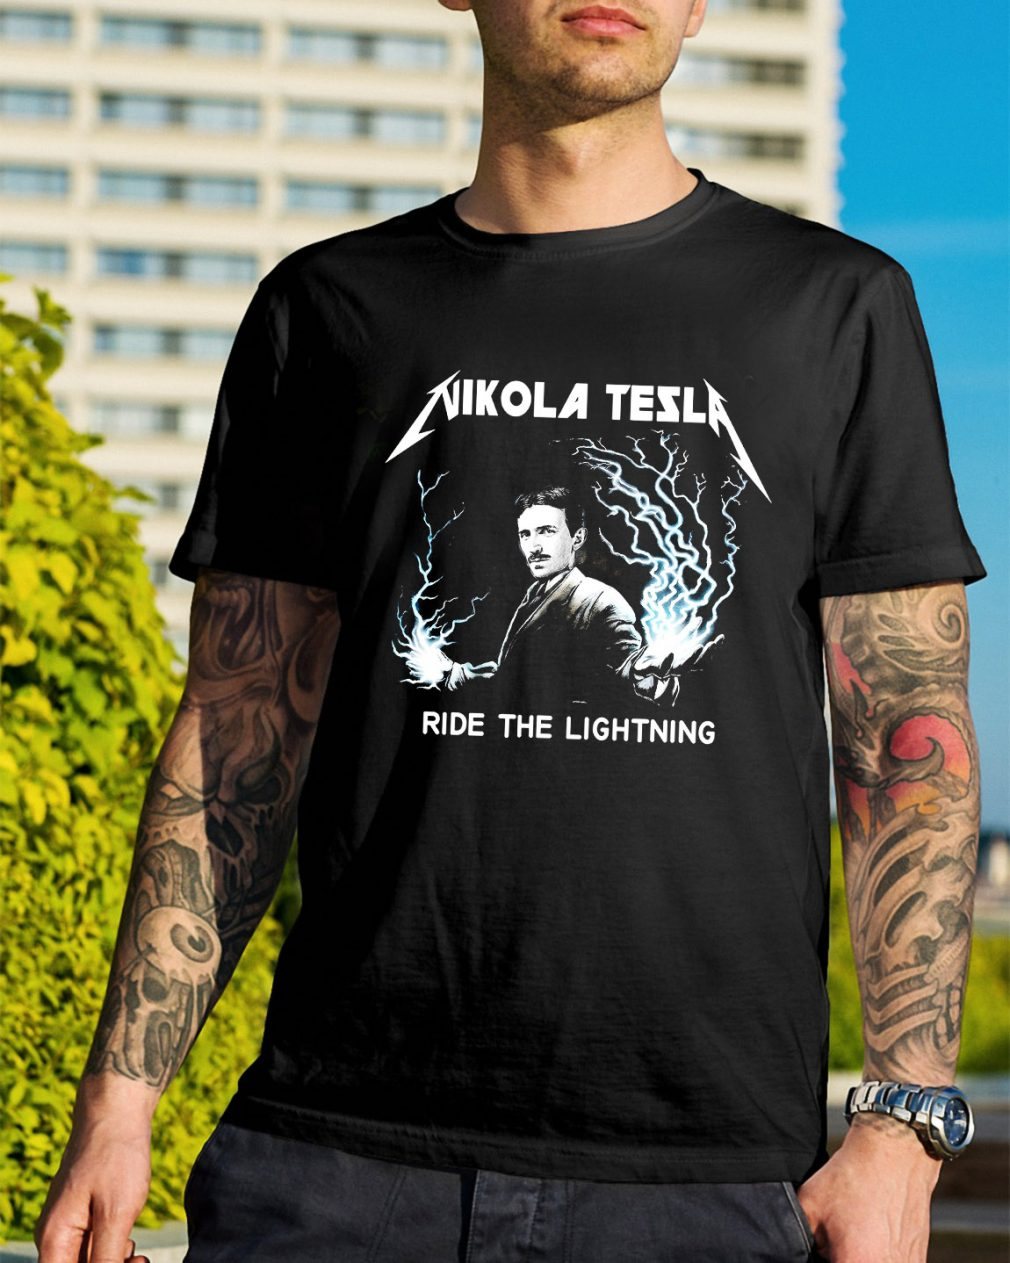 Nikola Tesla ride the lightning shirt